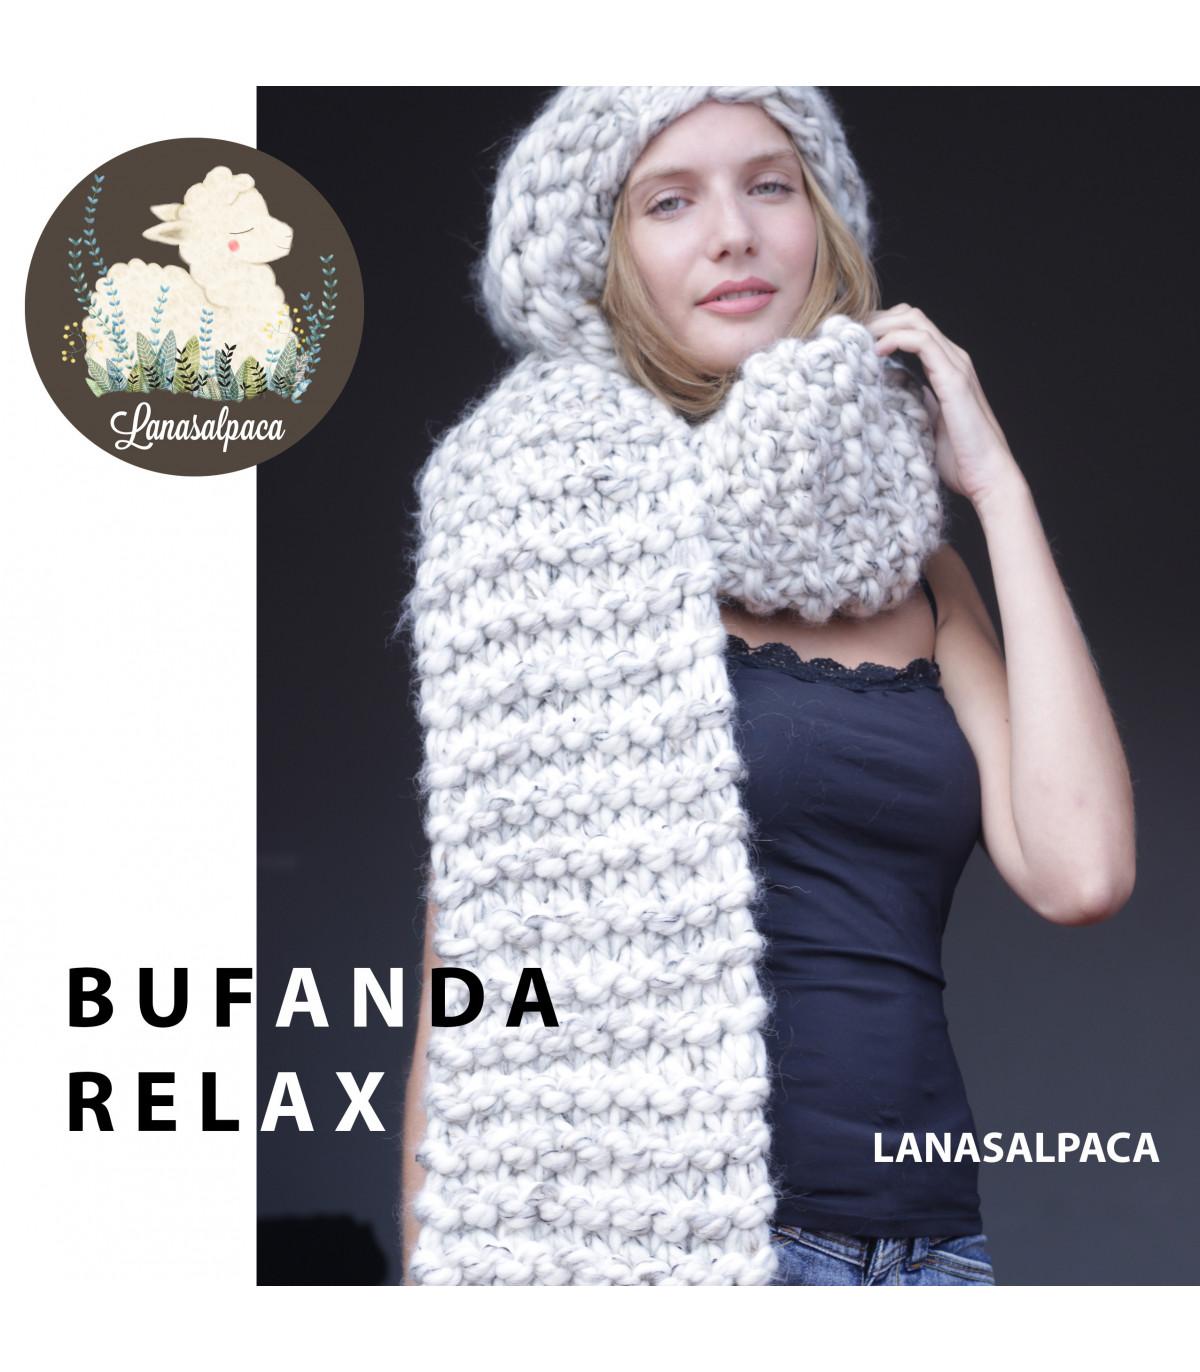 Bufanda Relax - Lanasalpaca